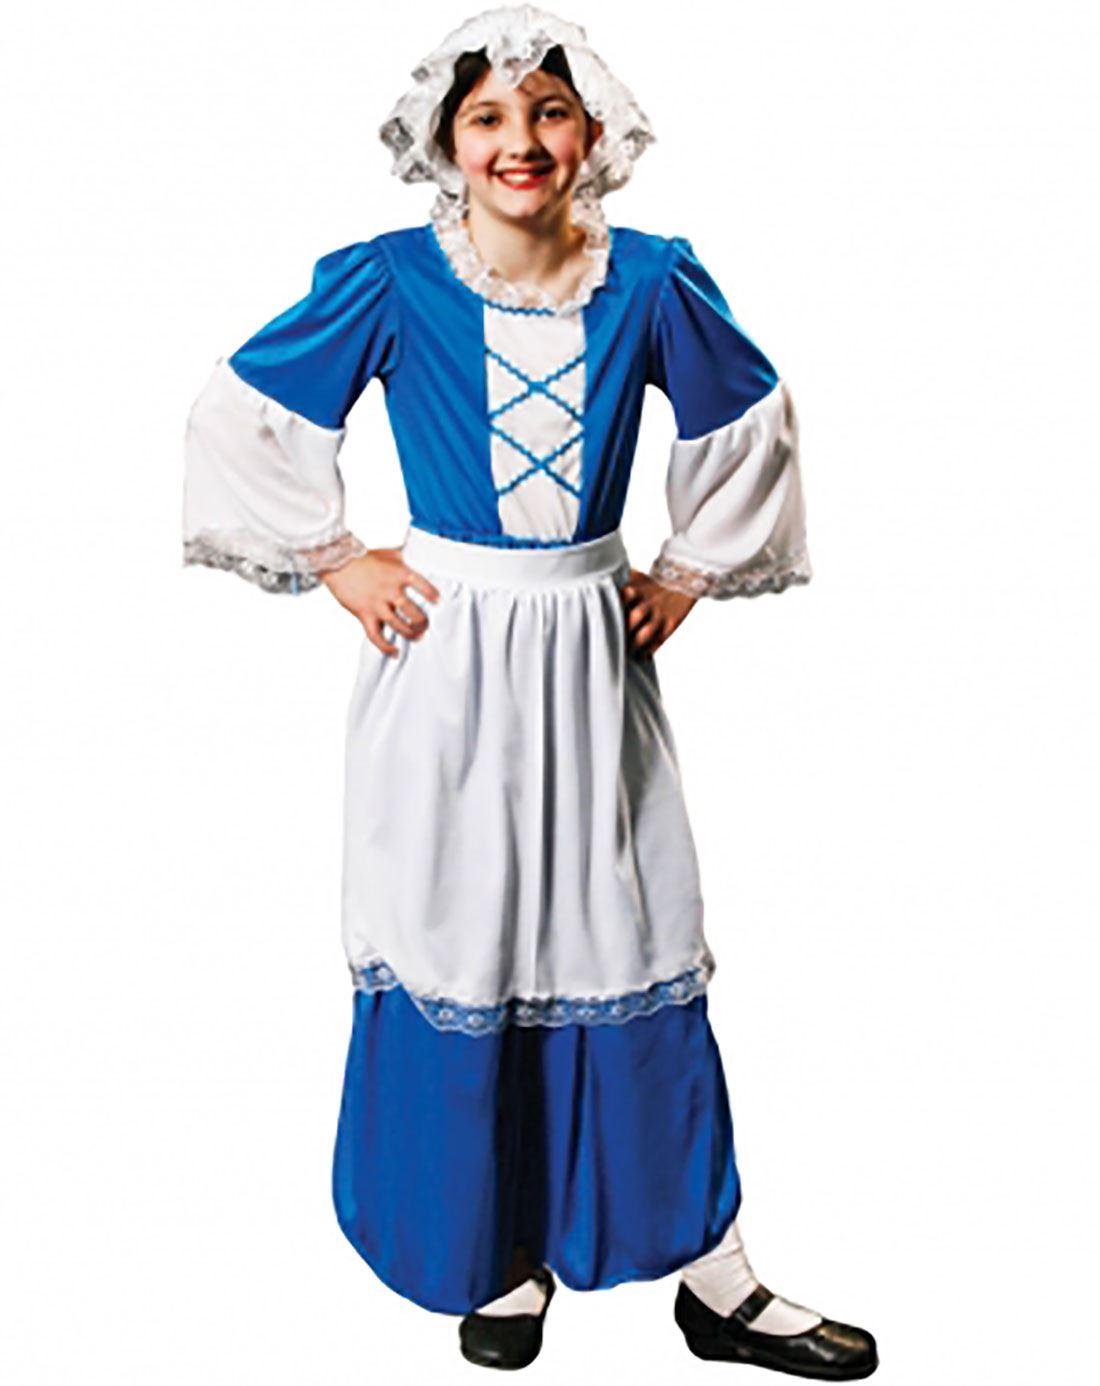 Enfant Tudor Girl Costume Filles pauvres Victorian Maid Livre Semaine Fancy Outfit